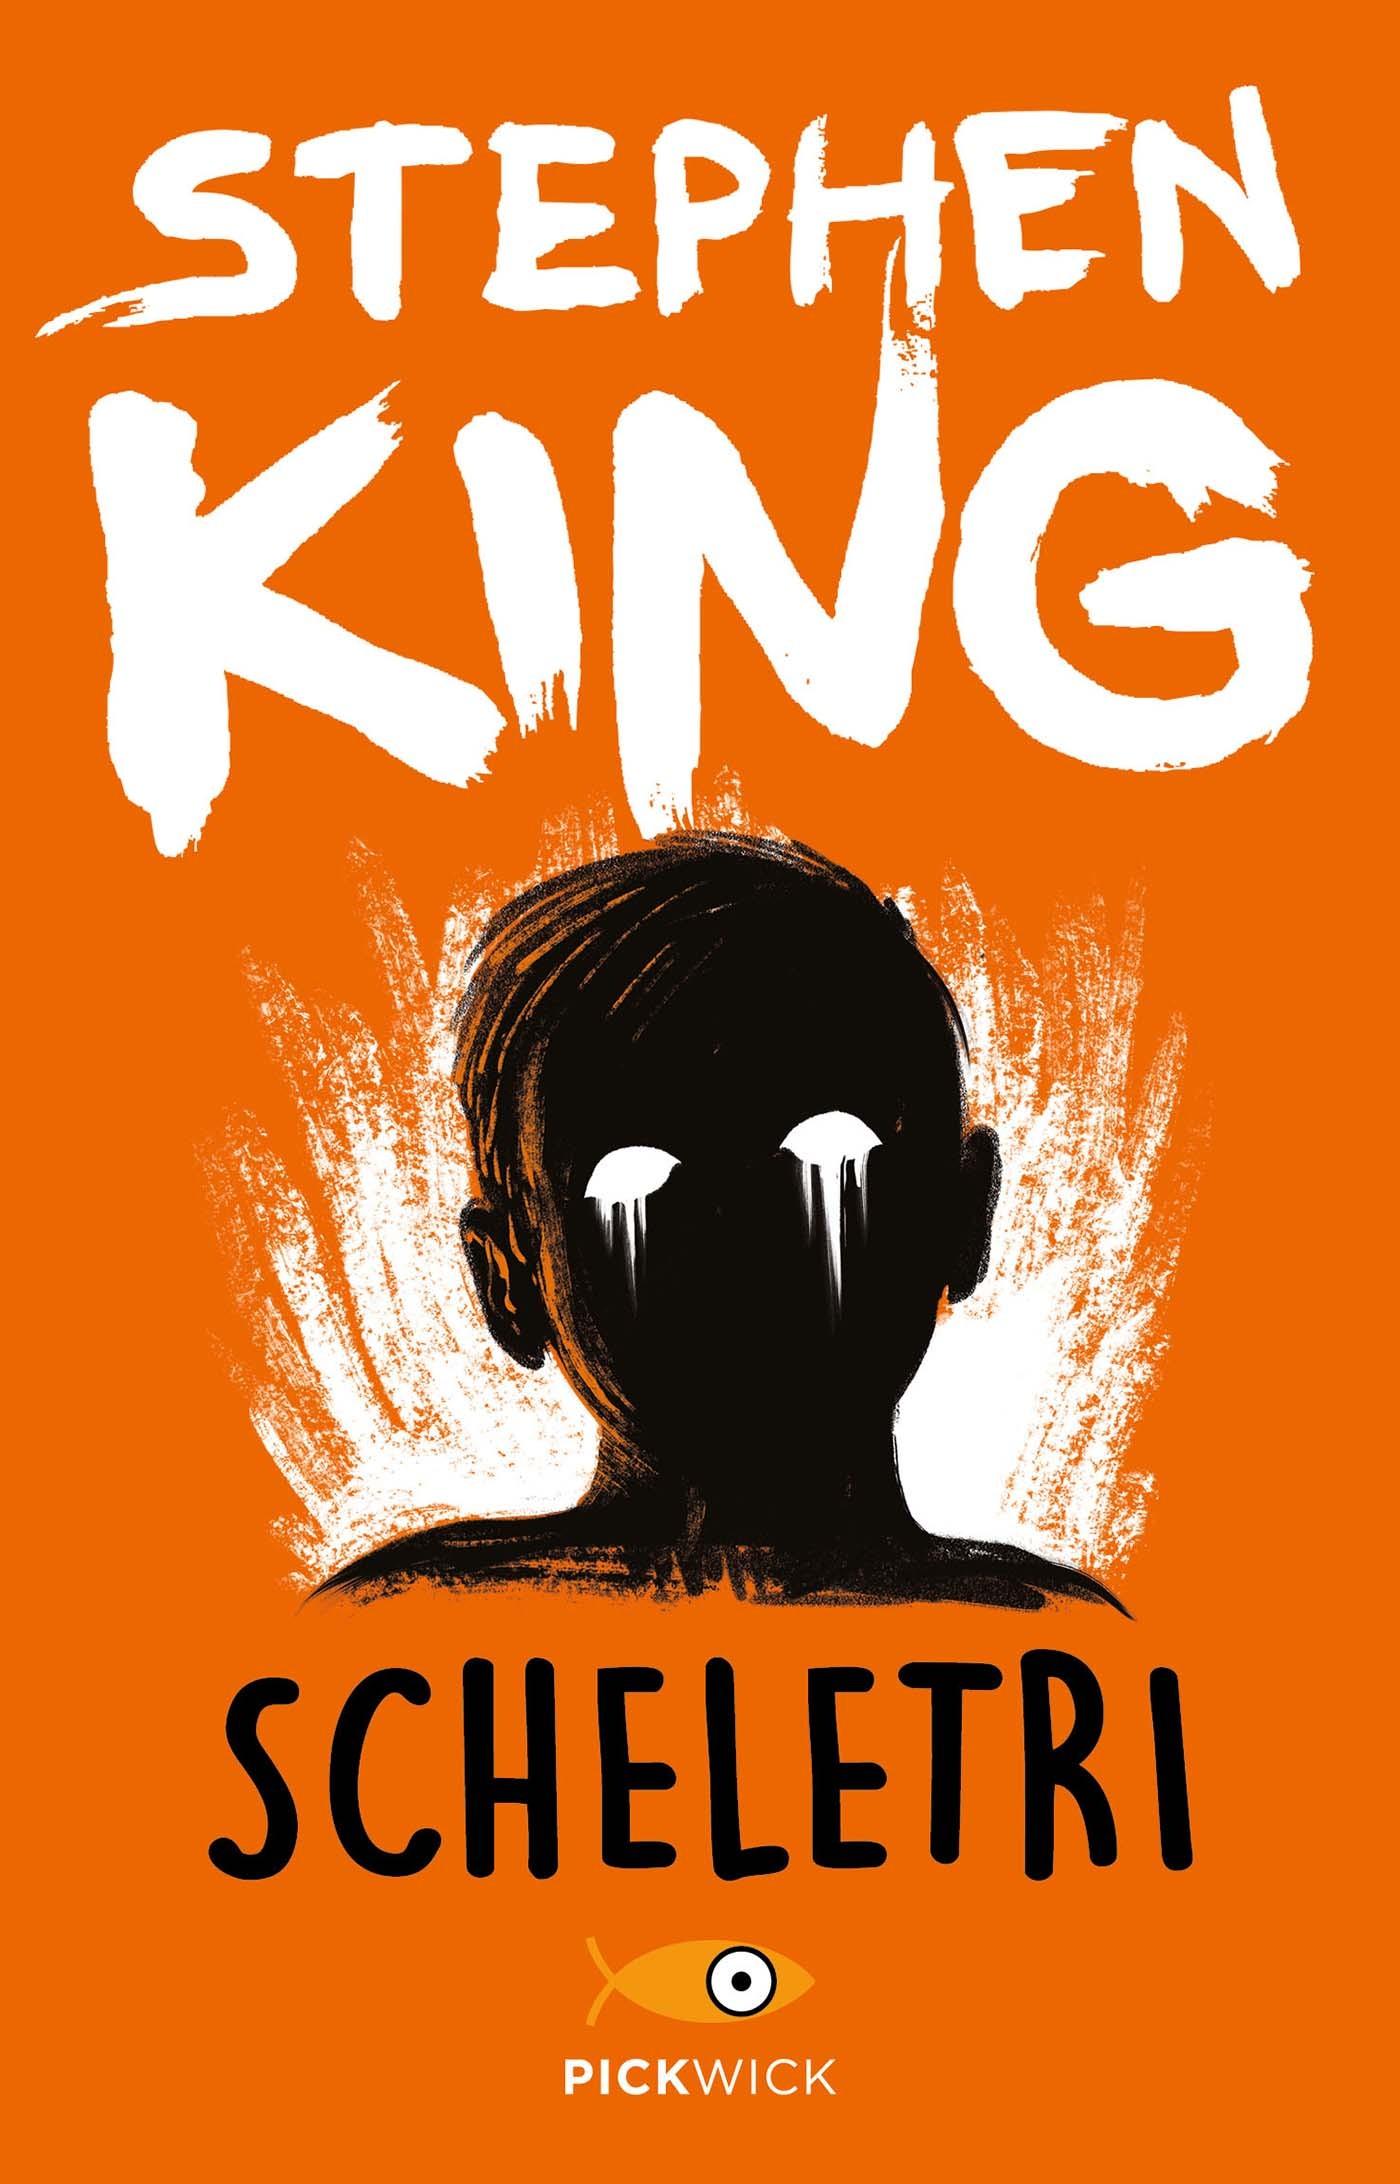 Book Cover Images Api : Scheletri stephen king ebook bookrepublic